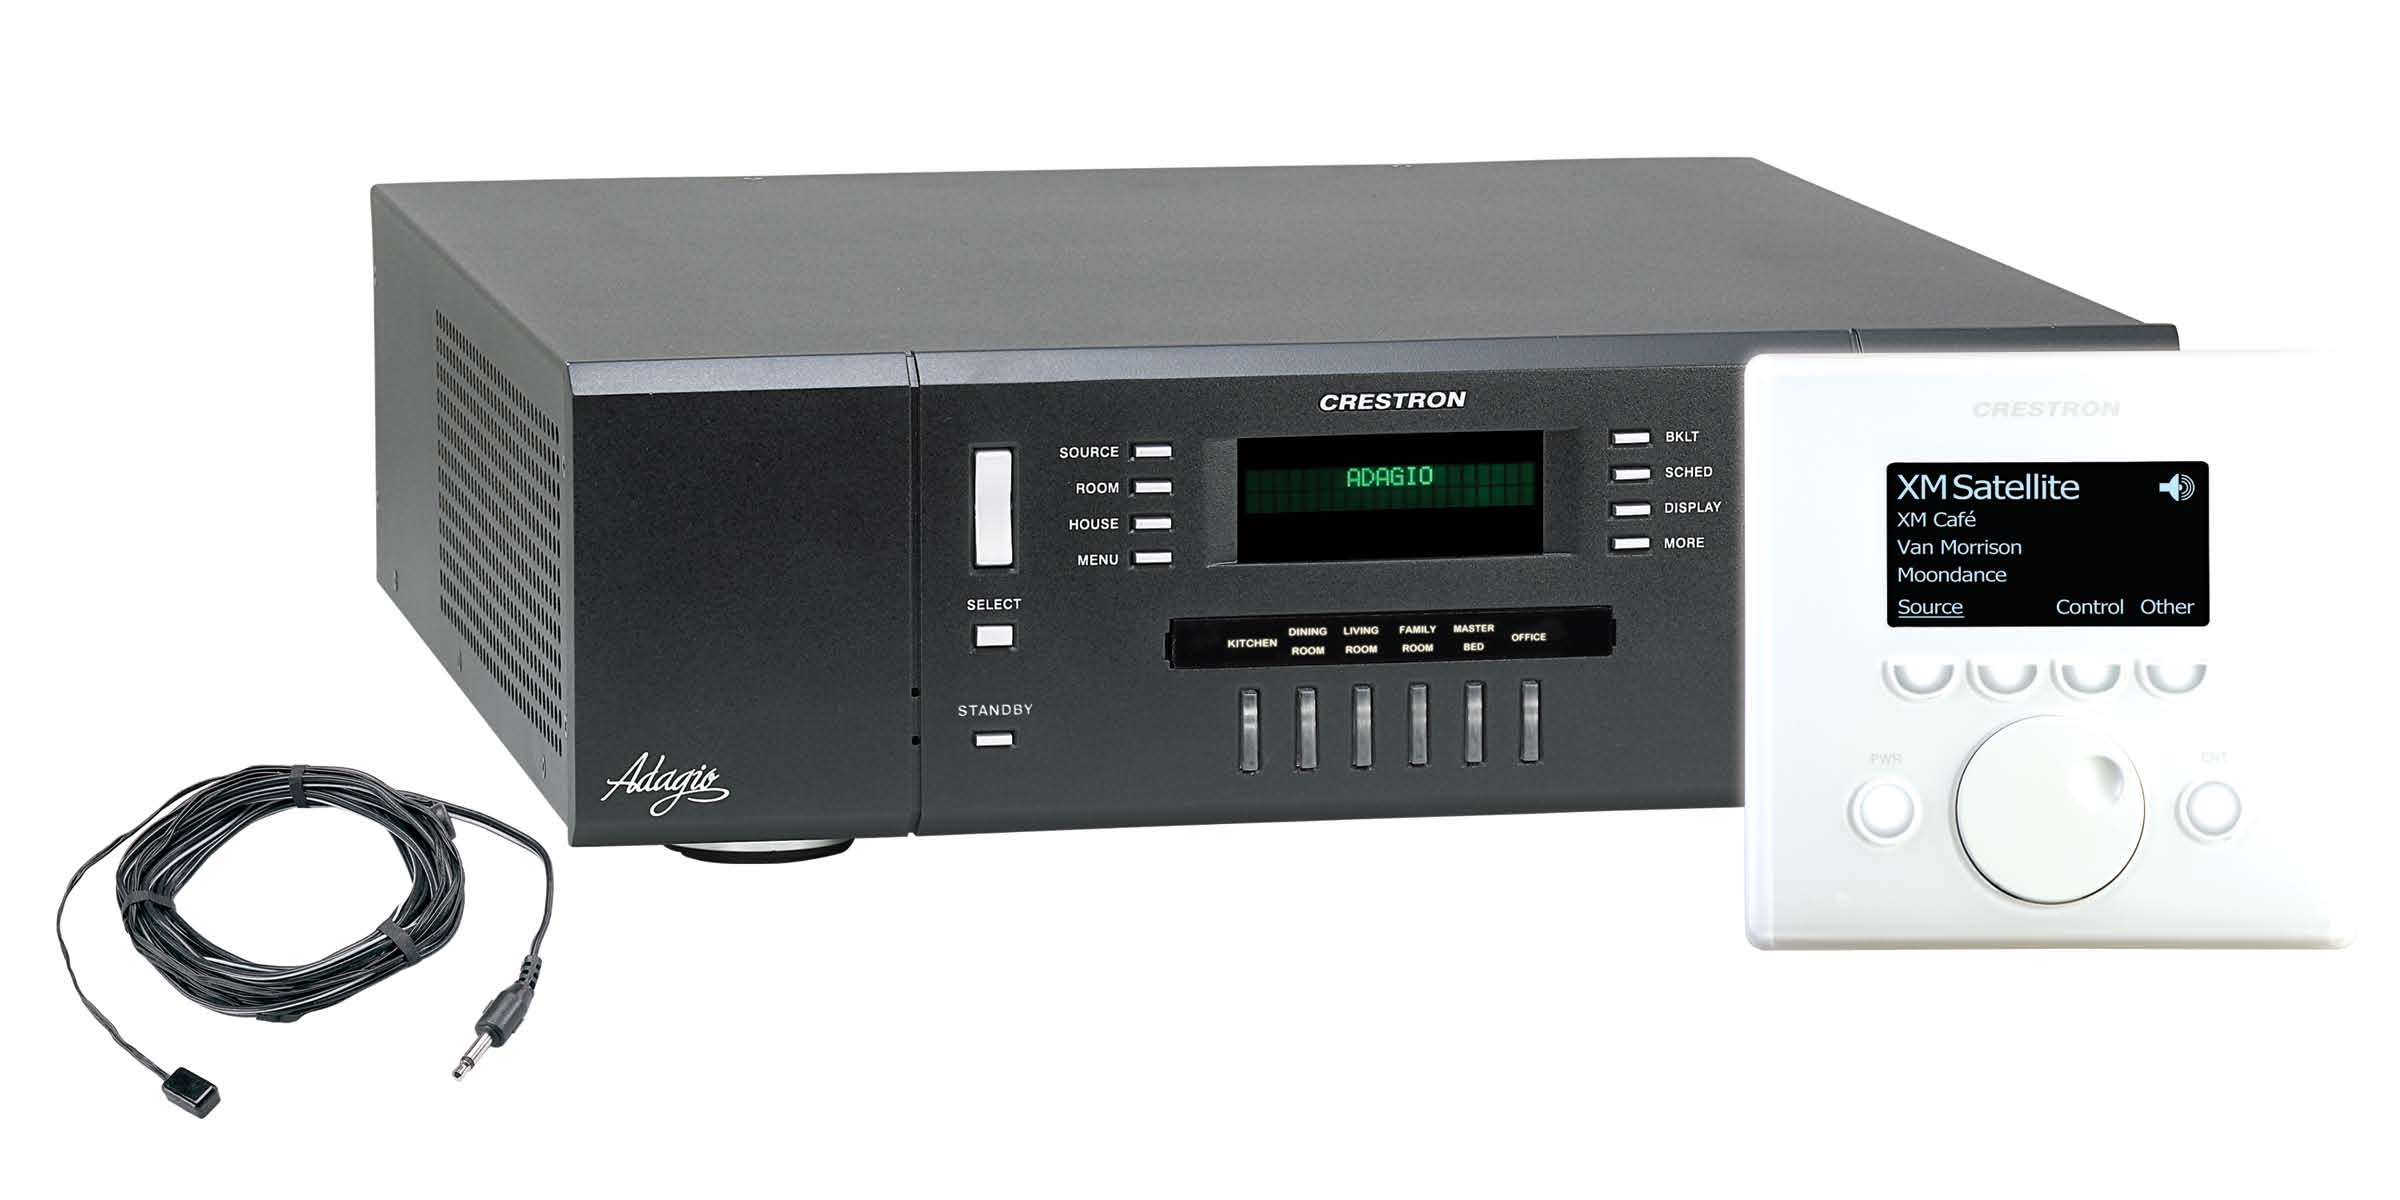 Echipamente de distributie audio-video CRESTRON - Poza 2